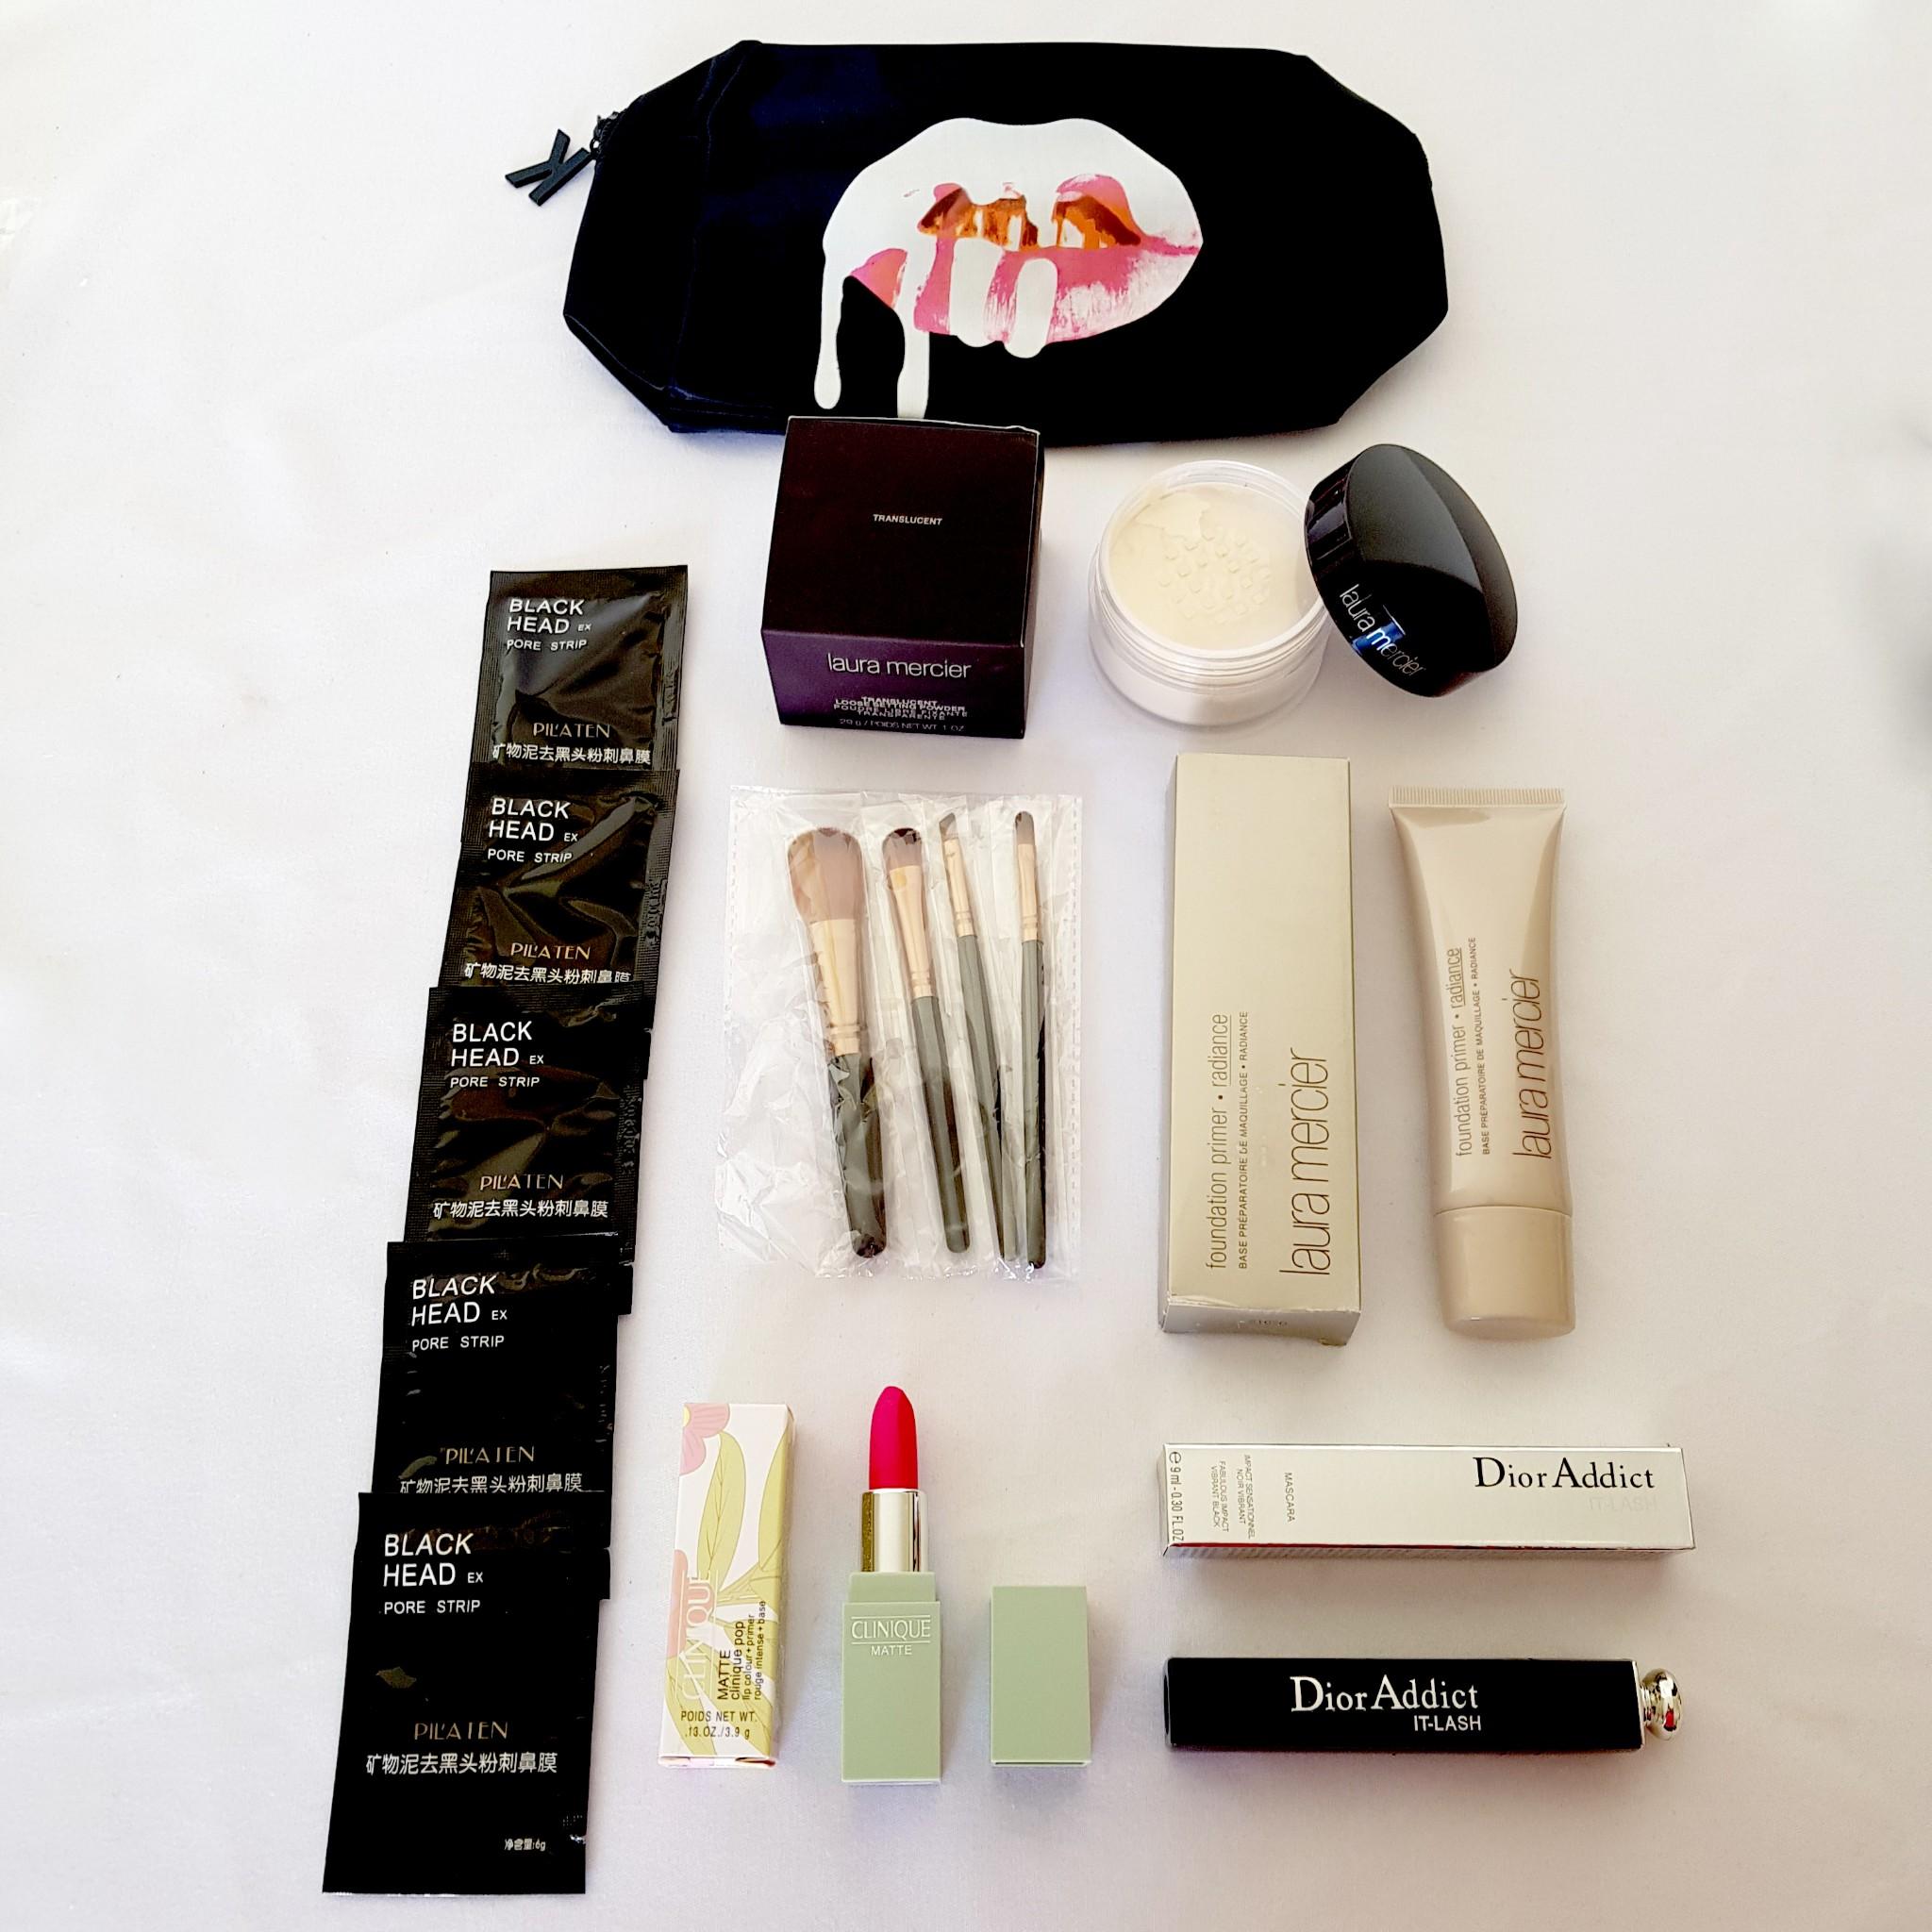 14pcs Lot Translucent Powder Primer Mascara Lipstick Face Brush Set Make Up Bag - Inspired Beauty Australia